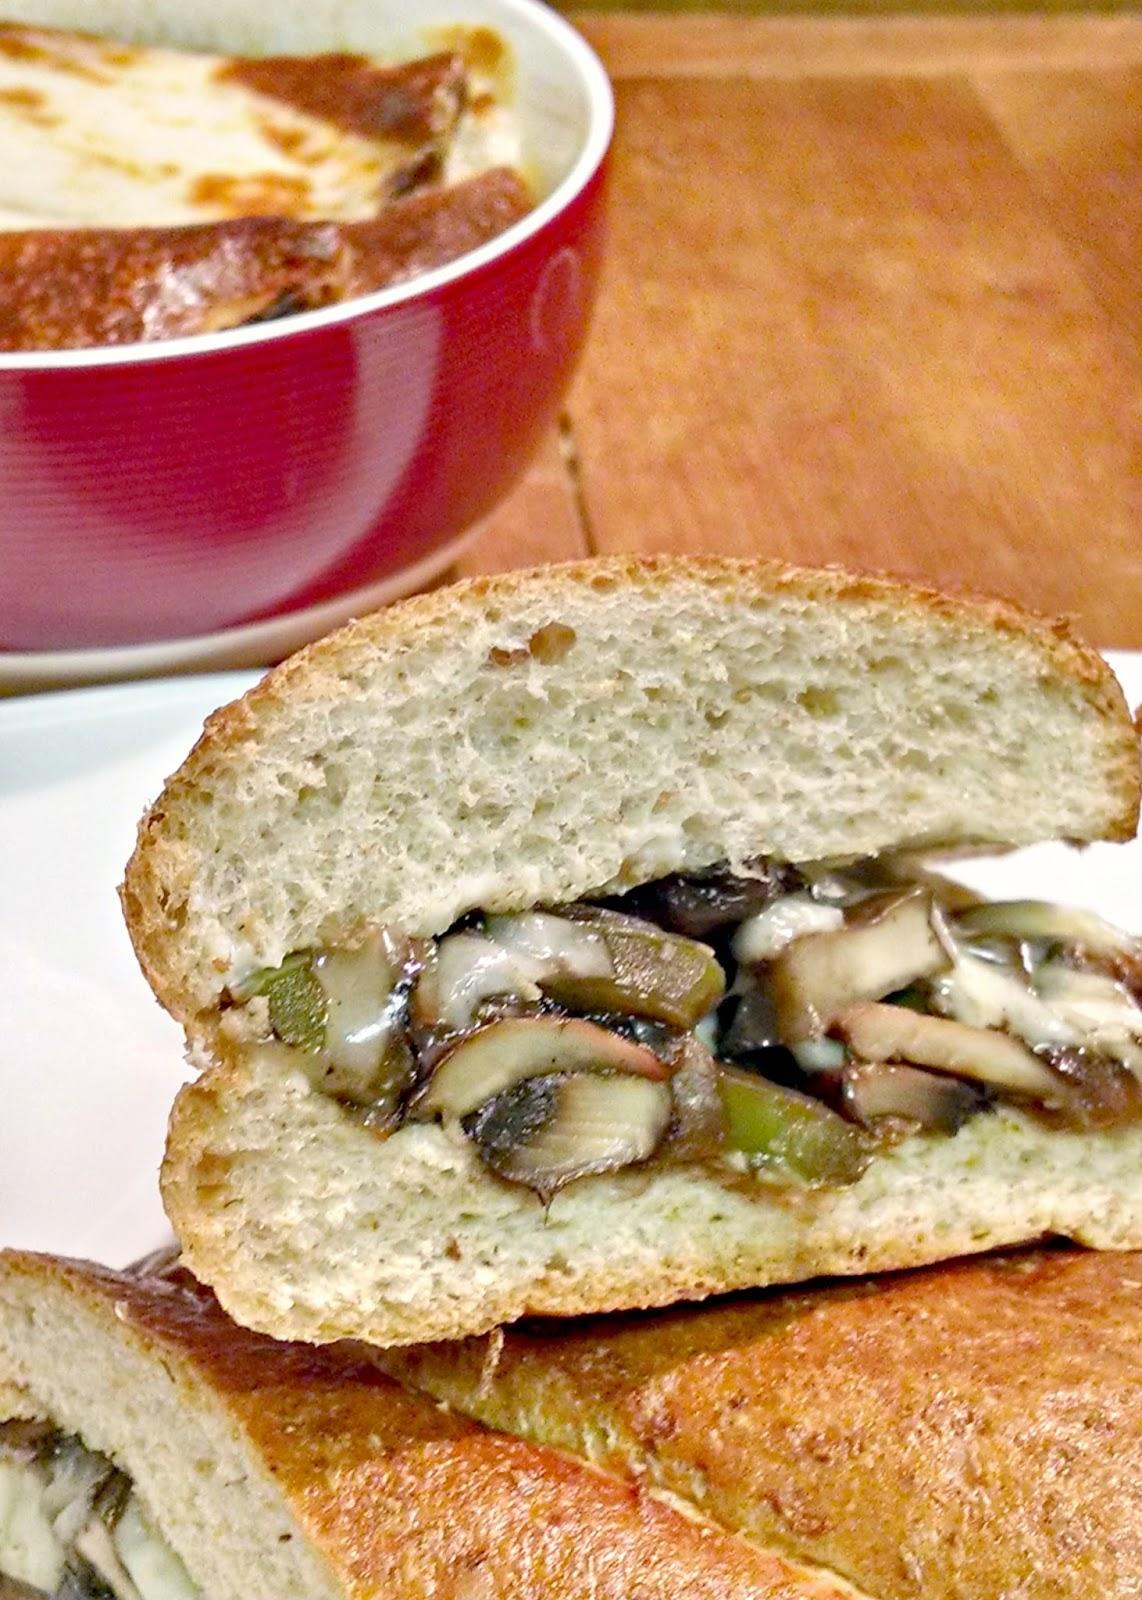 A Kitchen Hoor | Portobello Cheese Steak Sandwiches for #MeatlessMonday